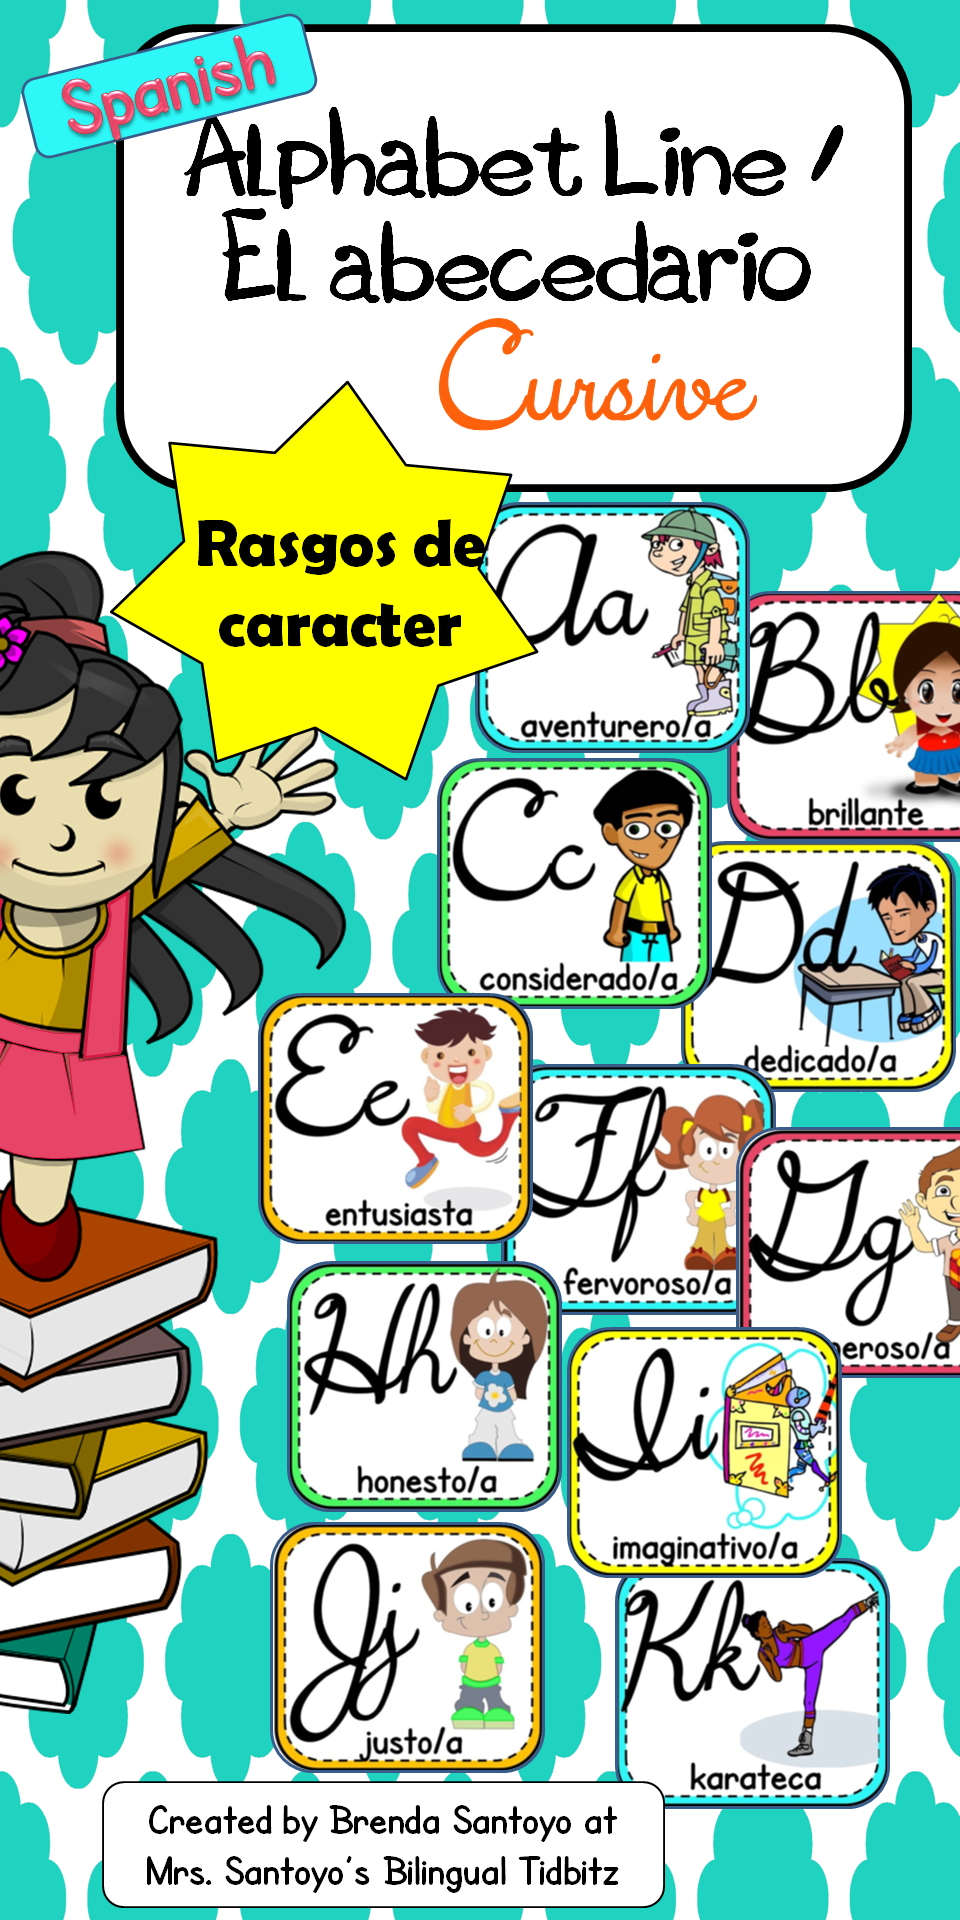 Alphabet Line El abecedario Cursive Character Traits in